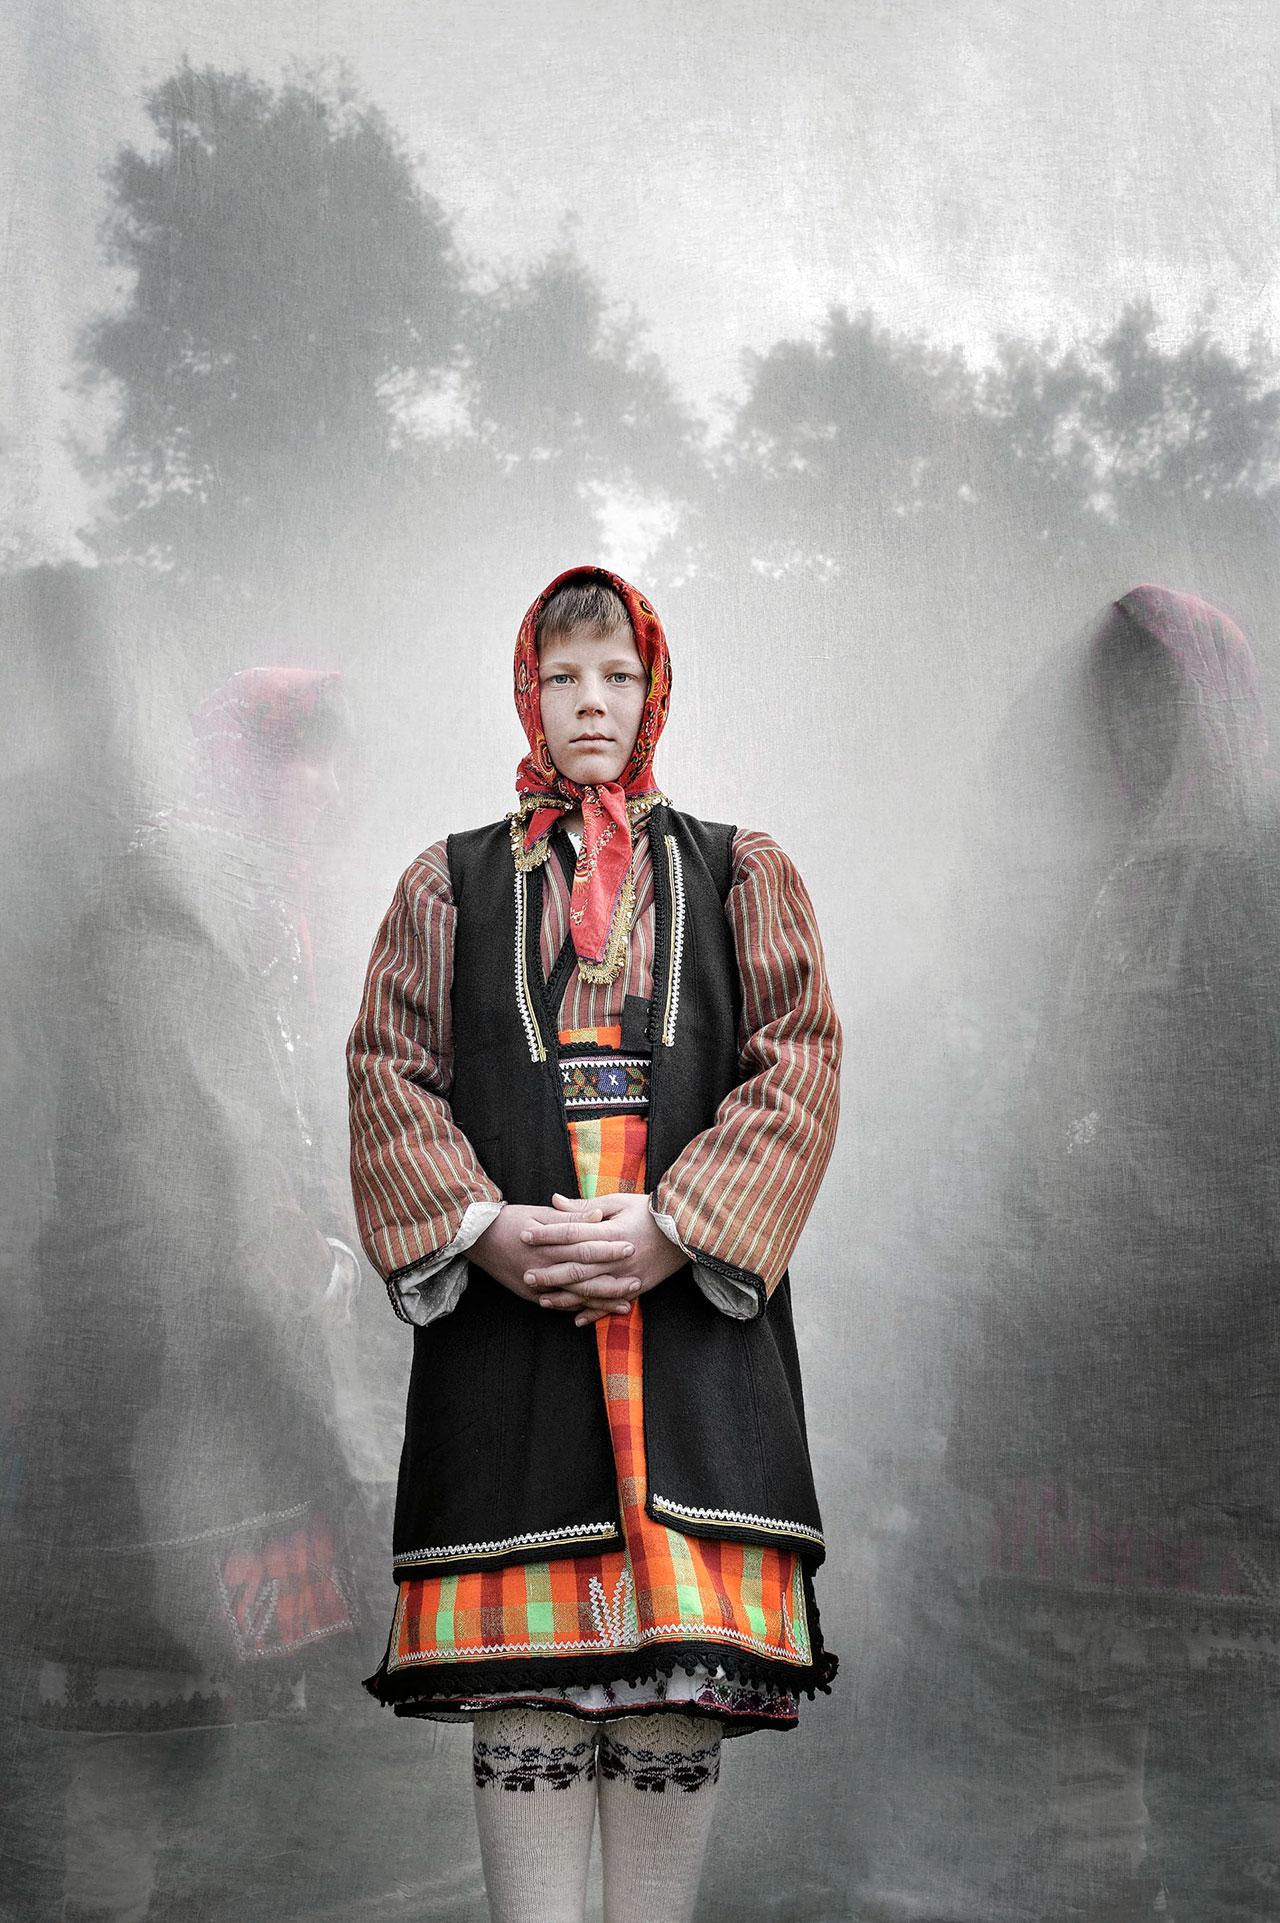 Faces + Masks series. Location: Monastiraki, Drama Prefecture, Greece. Photo © Nikos Vavdinoudis.